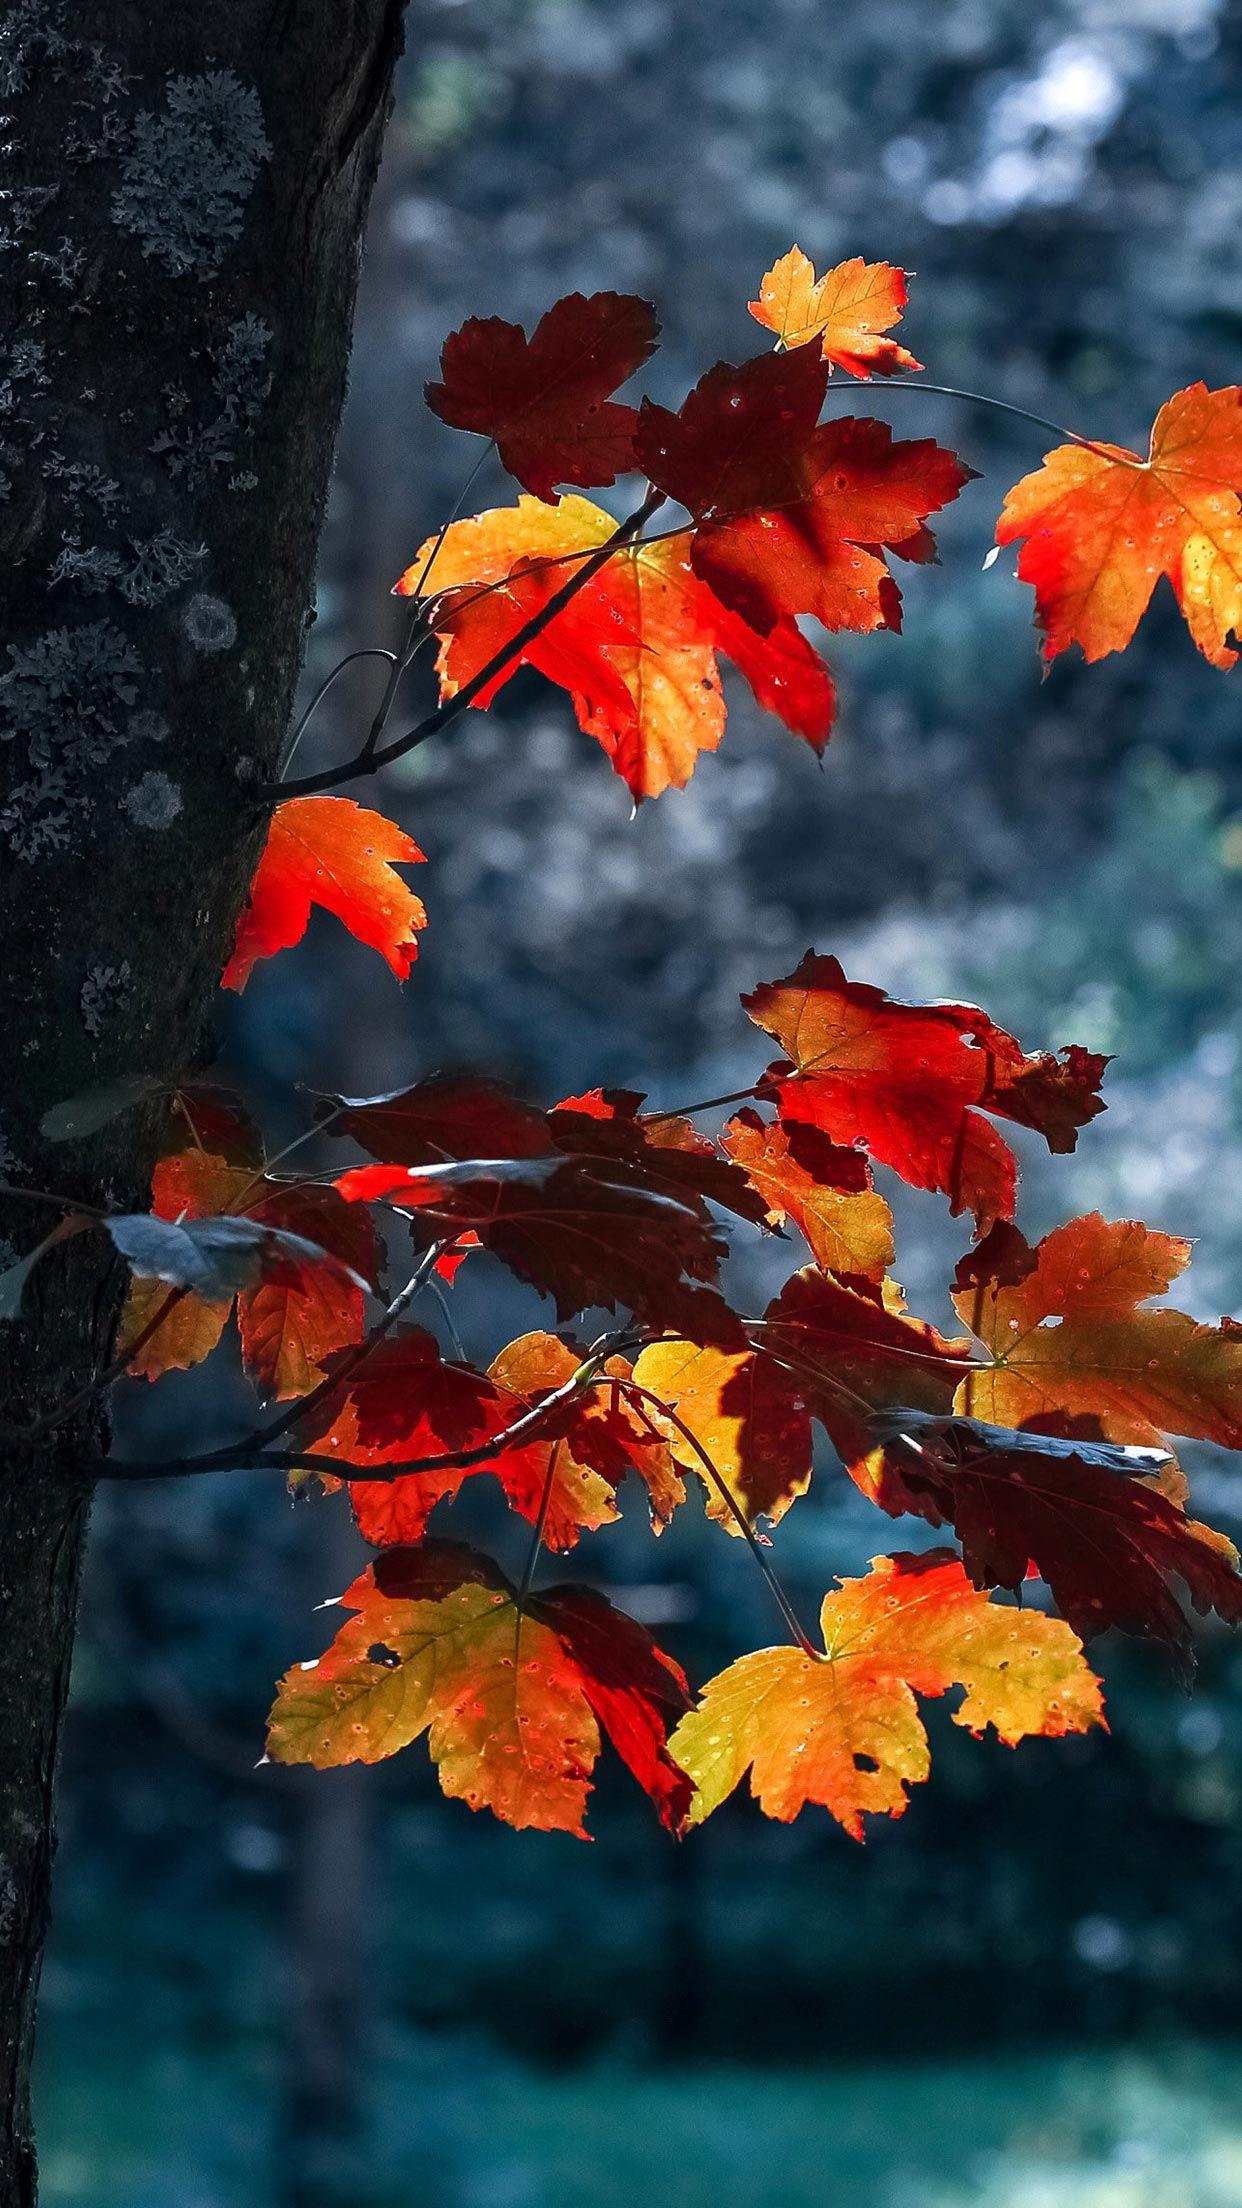 15 Fall Iphone Xs Wallpapers Best Autumn Backgrounds Iphone Wallpaper Fall Fall Wallpaper Landscape Wallpaper